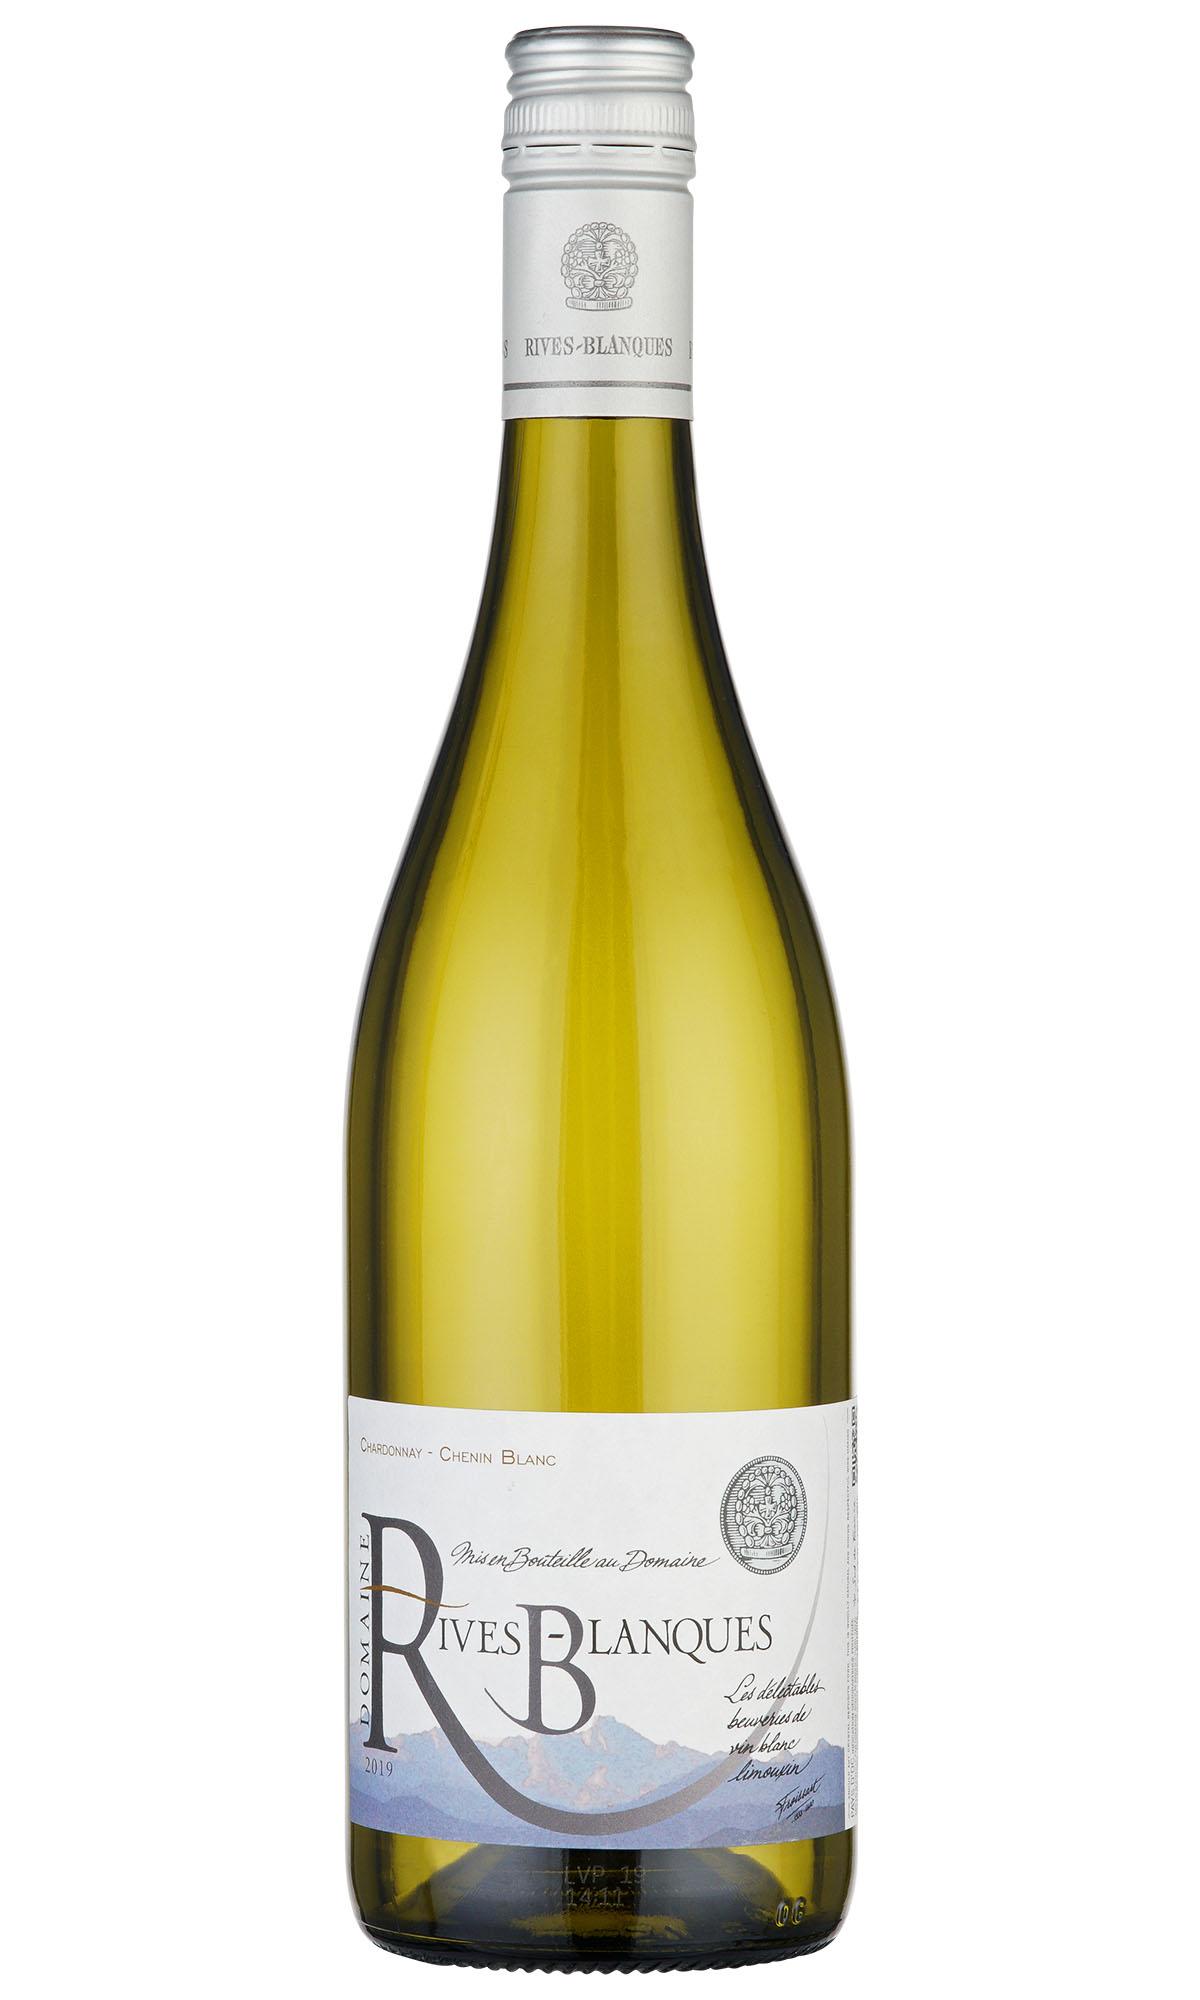 Chardonnay-Chenin Blanc - IGP Pays d'Oc Limoux - 2019 / 0,75l - Domaine Rives-Blanques